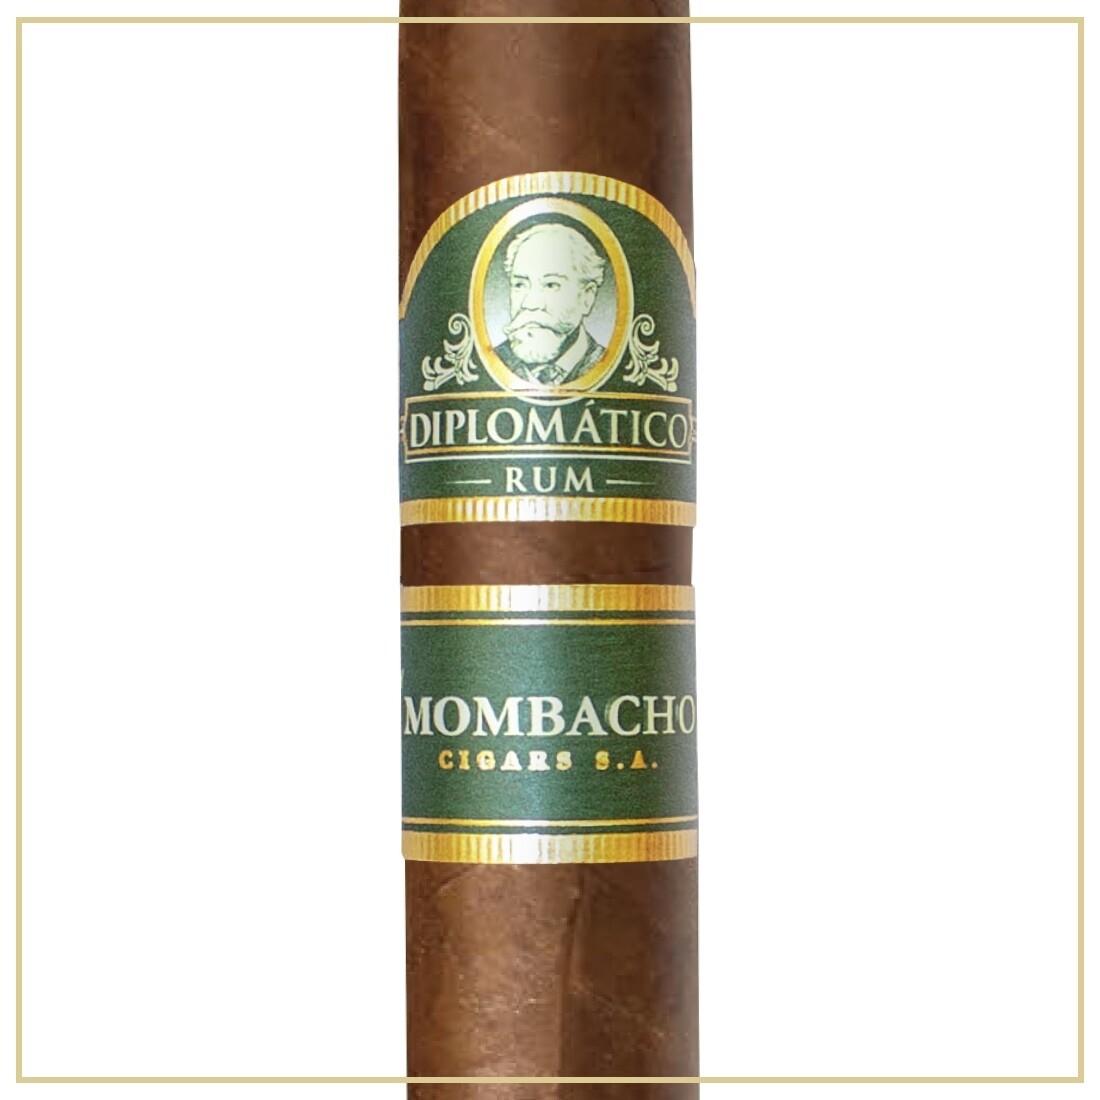 Mombacho Diplomatico Robusto 5 x 50 Single Cigar